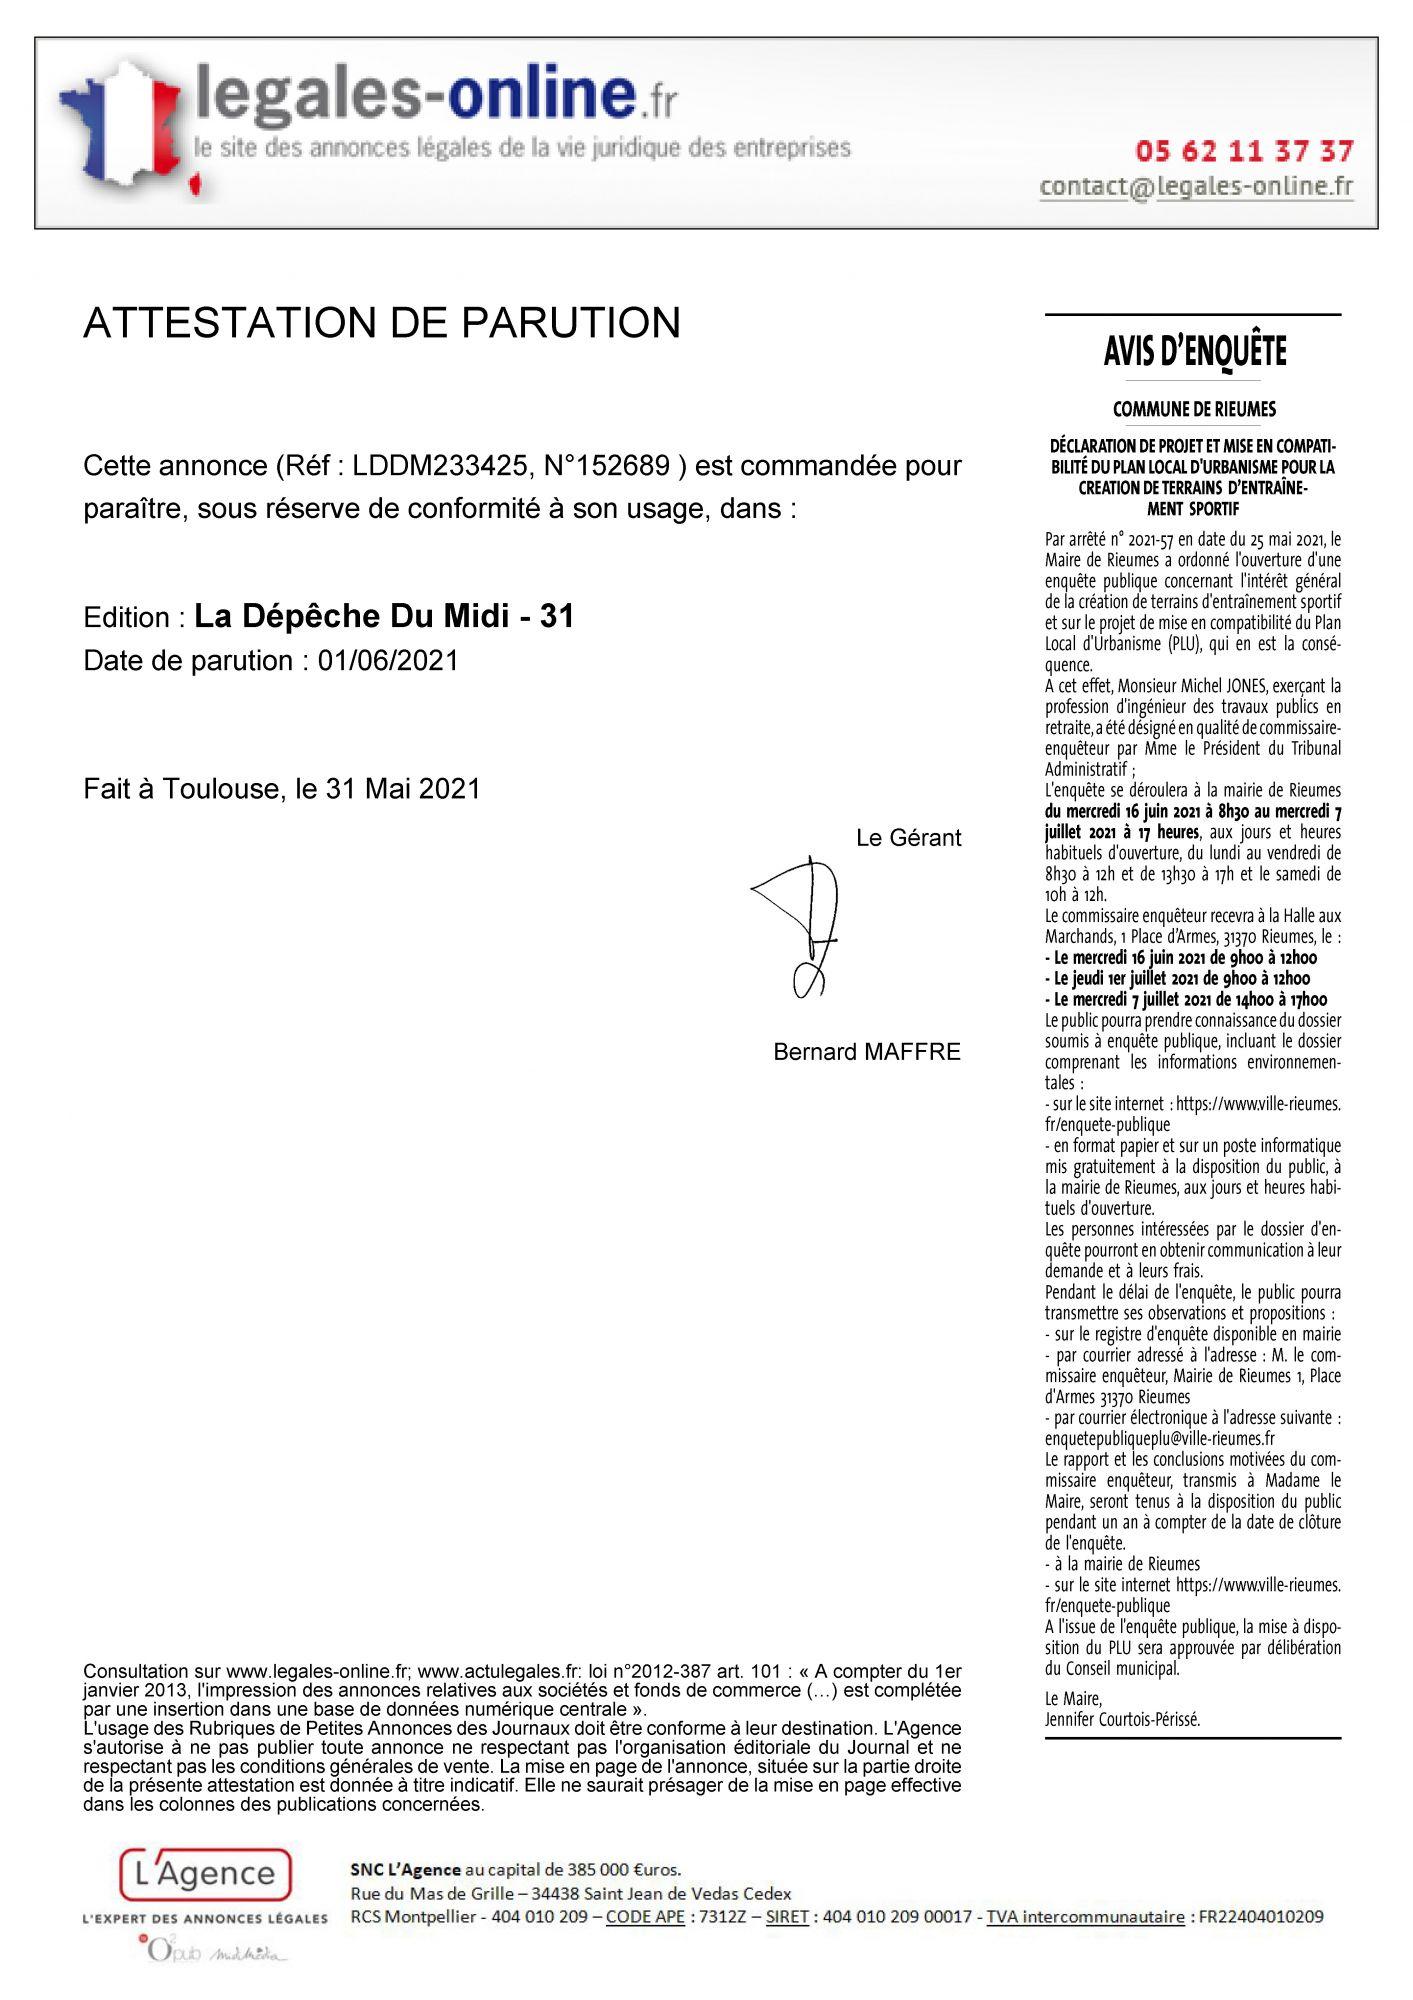 attestation-ss-prix-LDDM233425 (1)